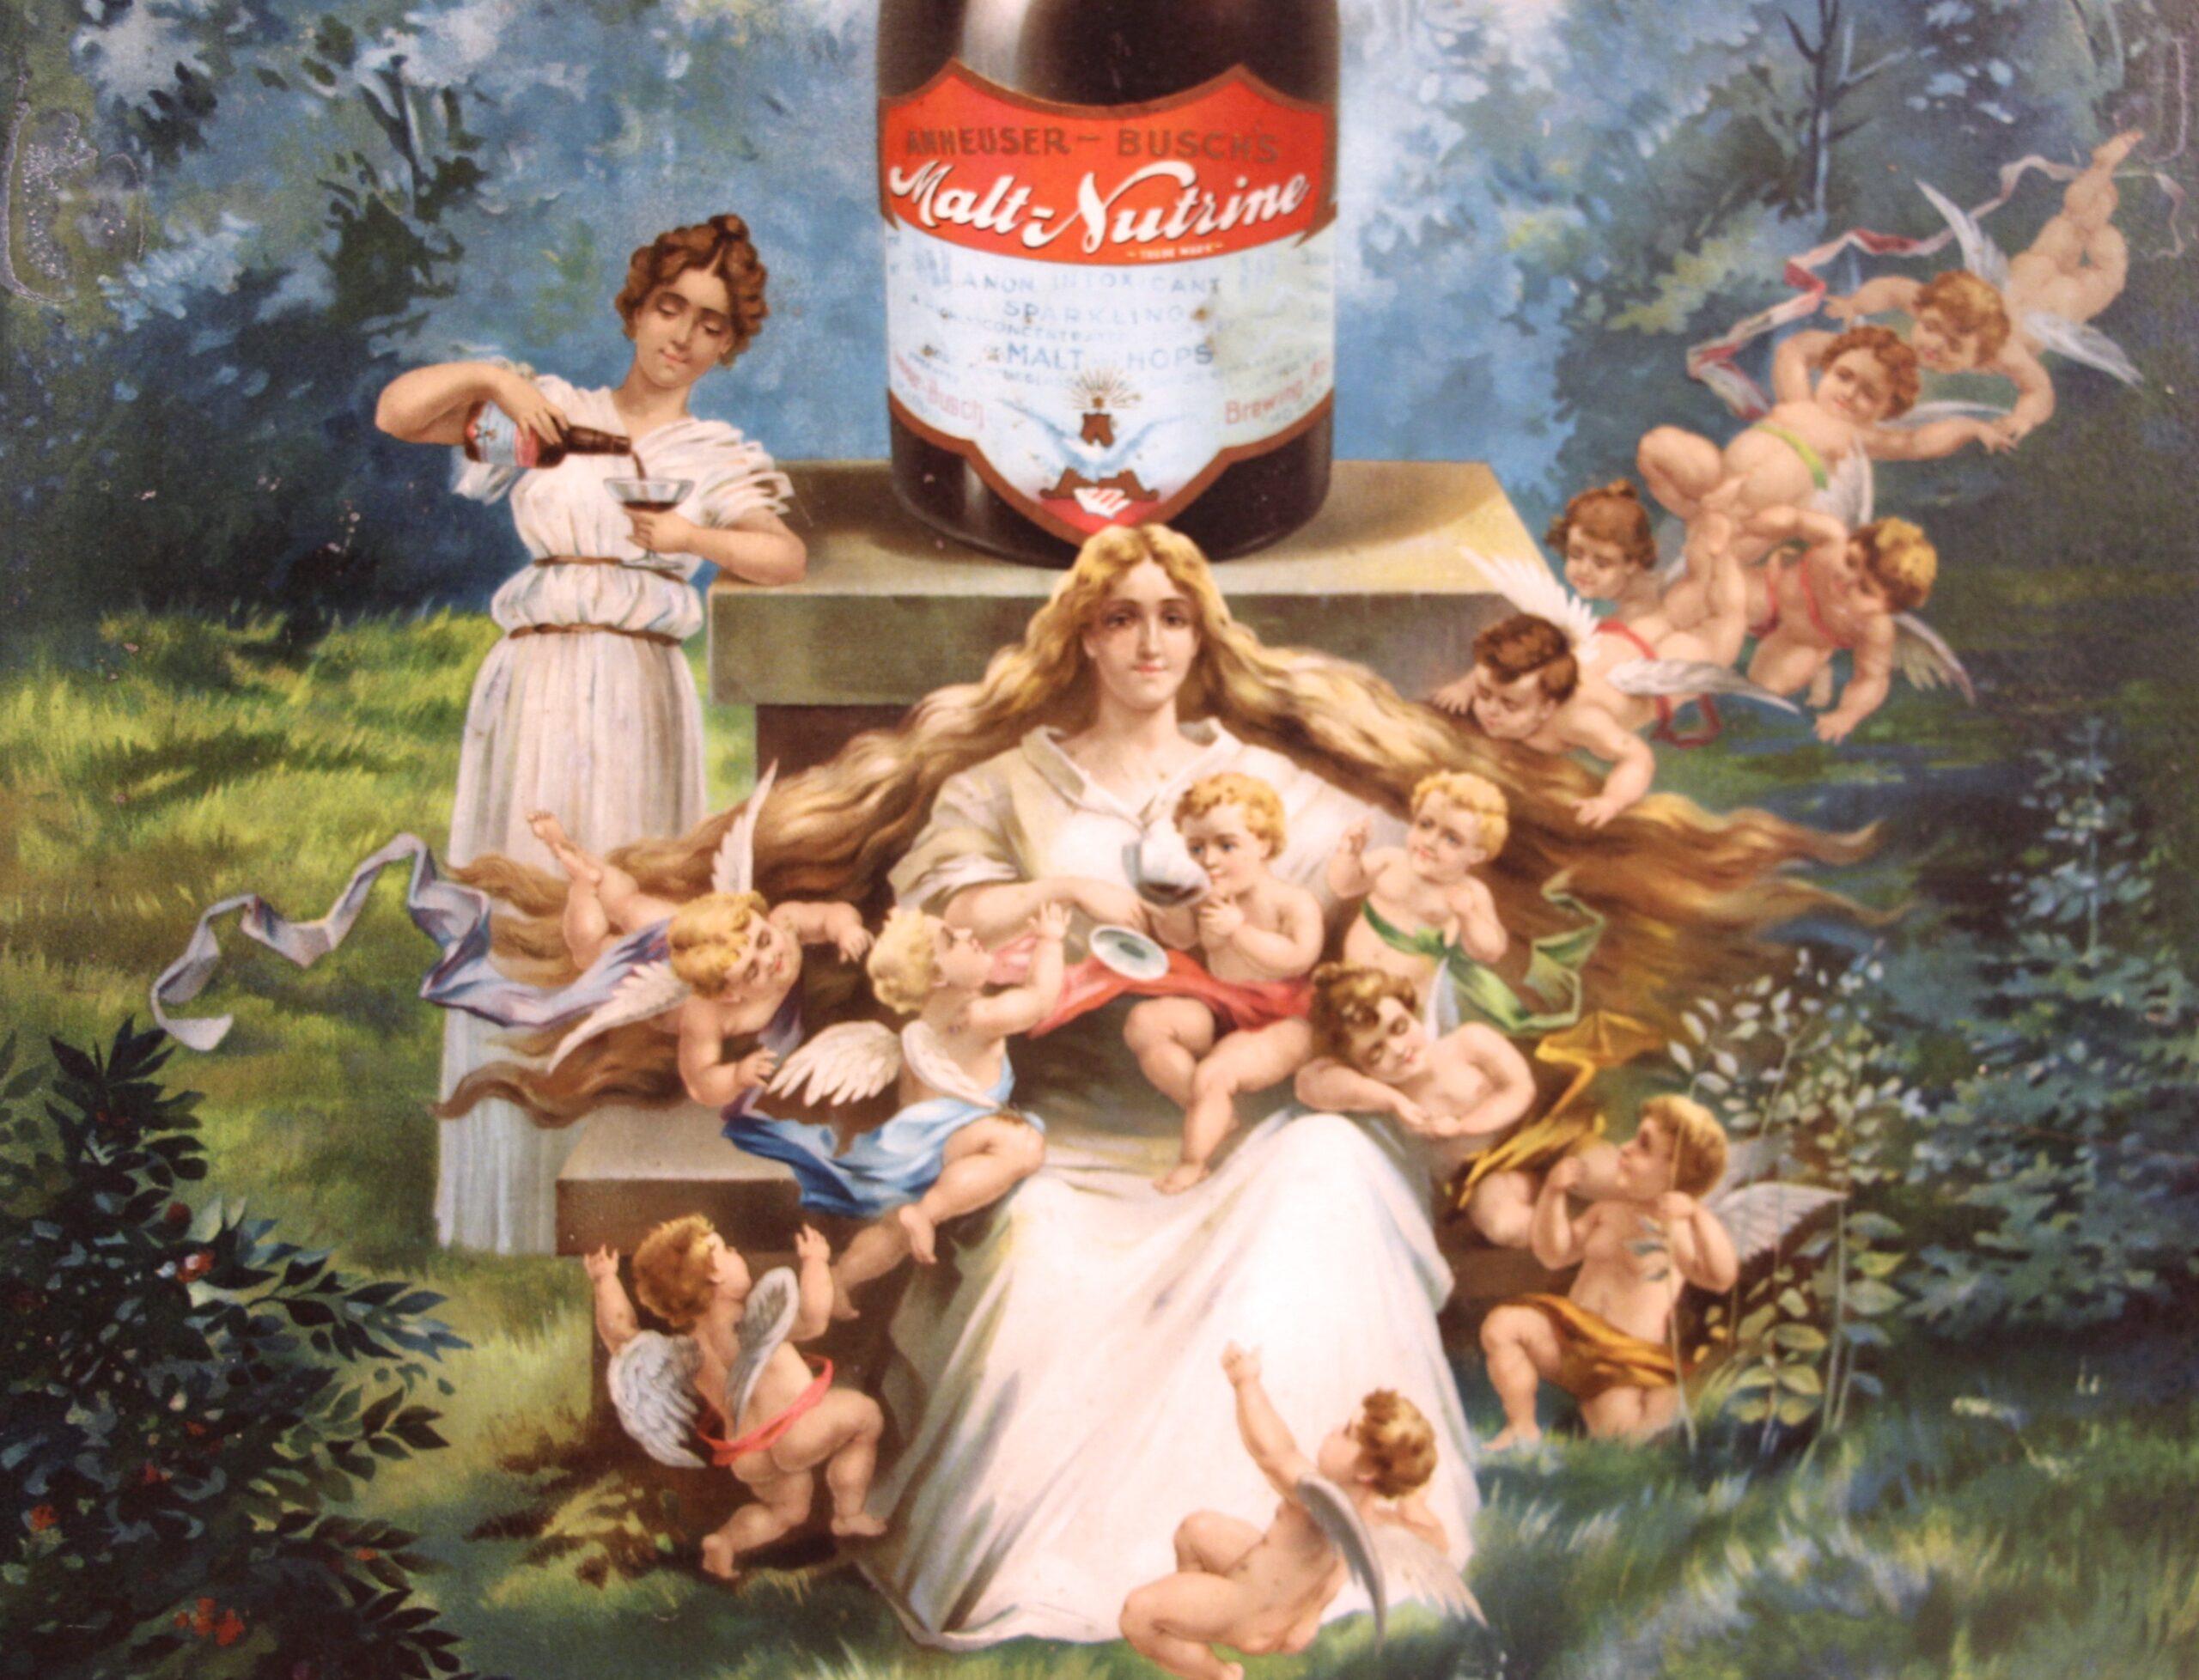 Anheuser-Busch Malt-Nutrine Fountain of Health Sign Details